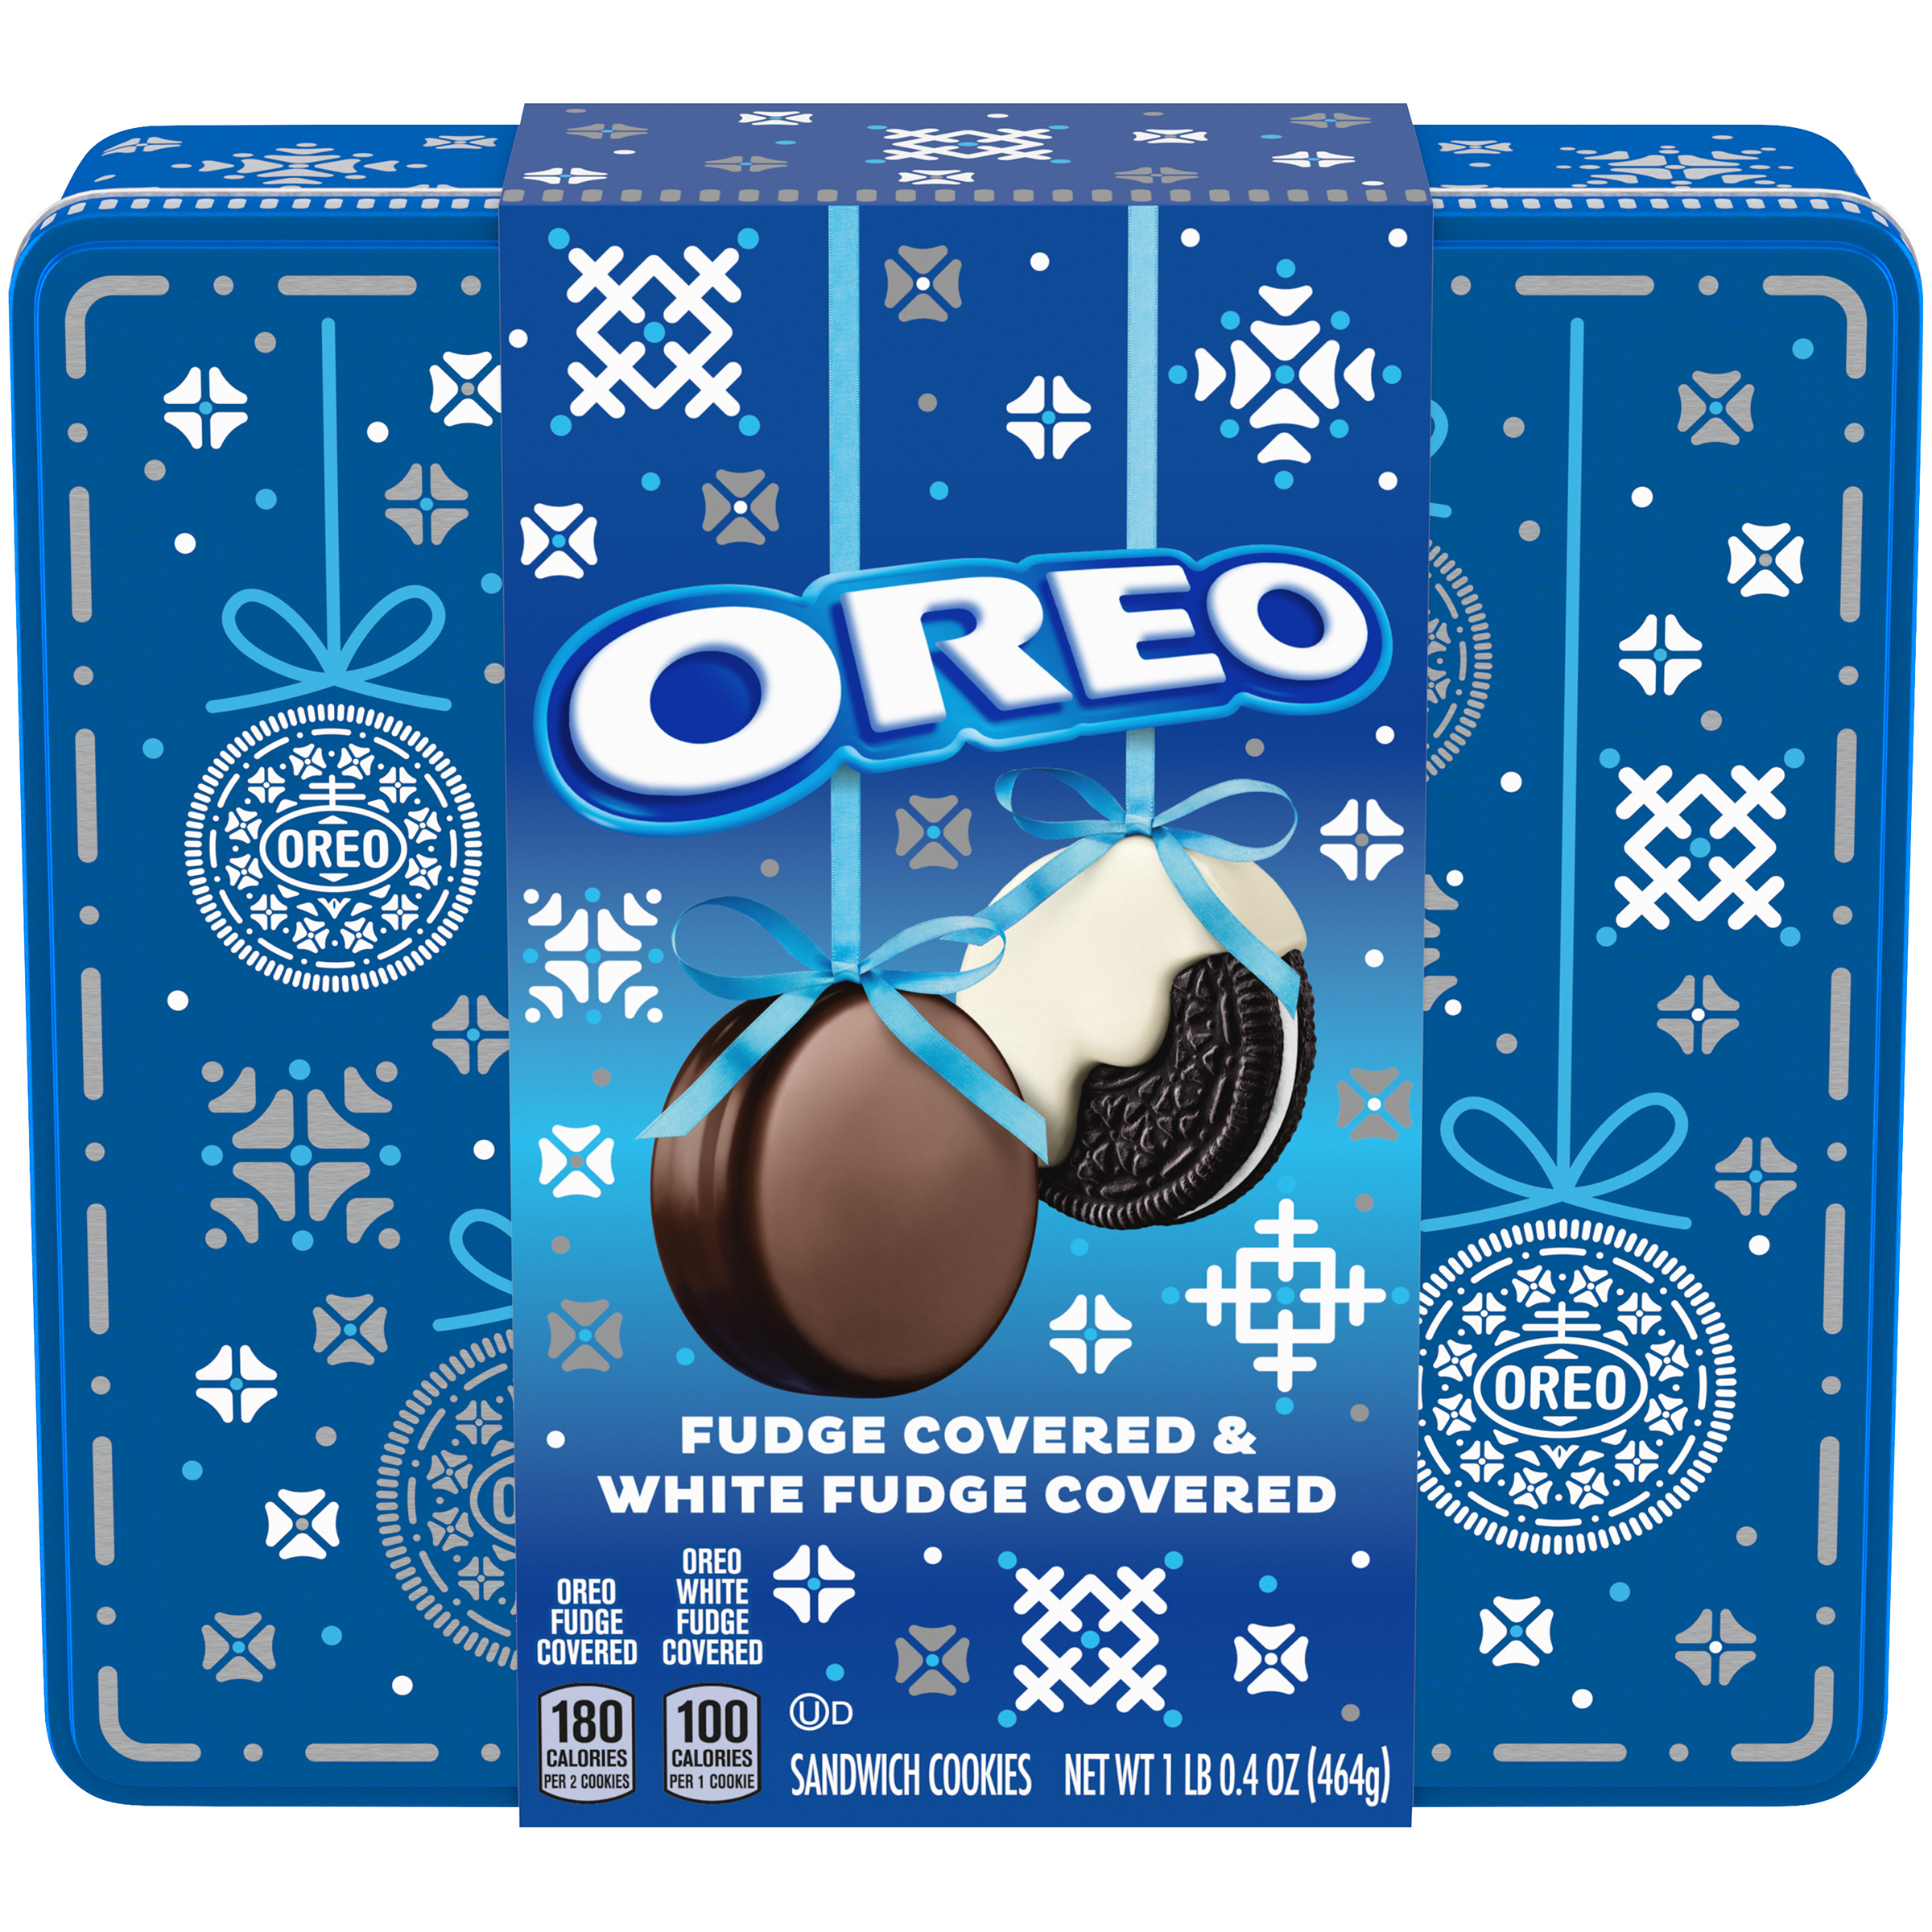 OREO Fudge Covered Cookies 16.4 oz